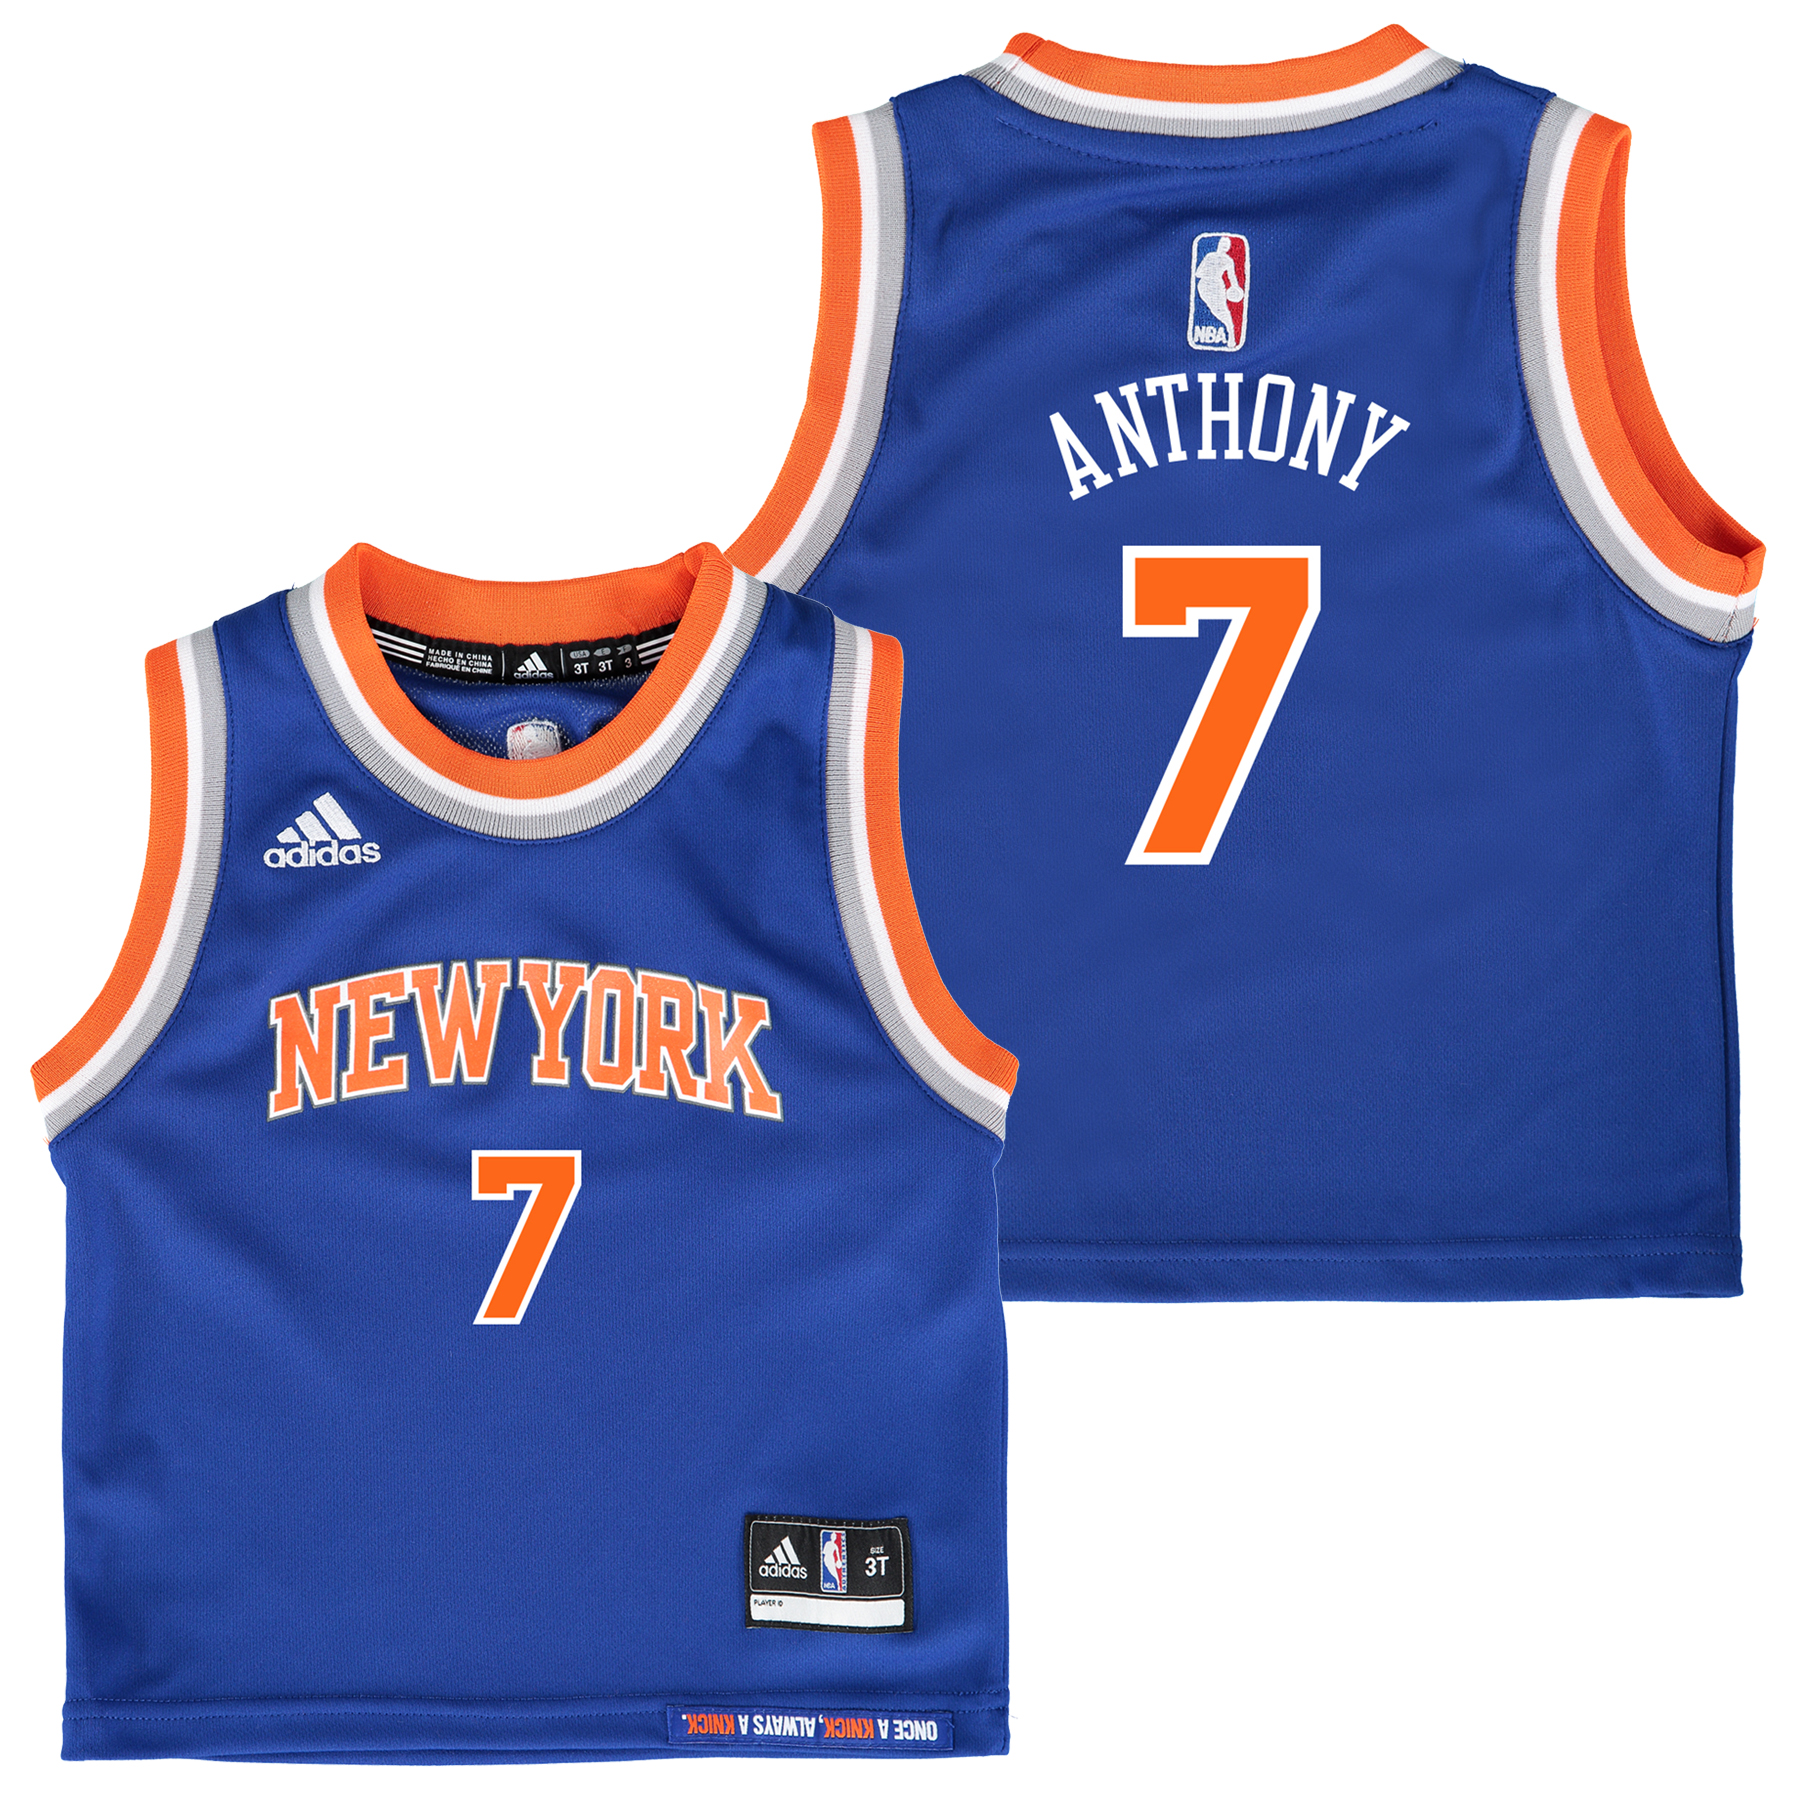 New York Knicks Road Replica Jersey - Carmelo Anthony - Kids